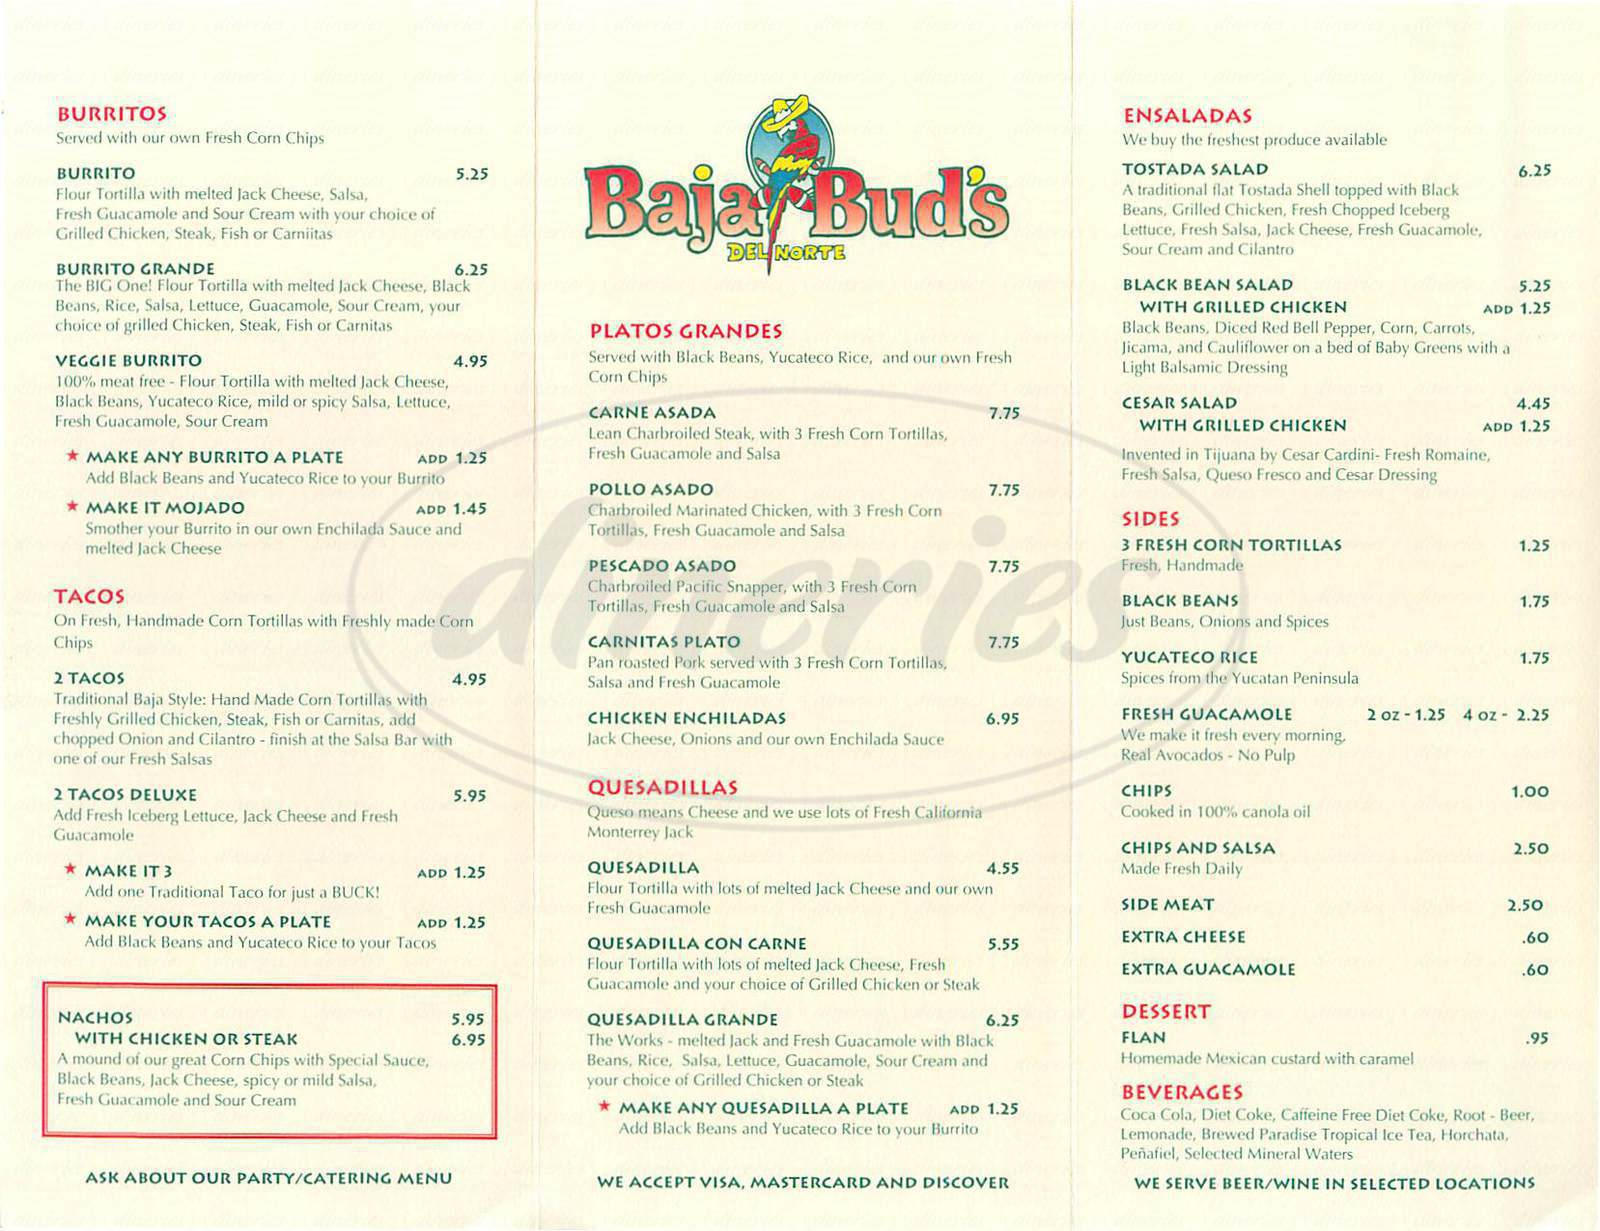 menu for Baja Buds